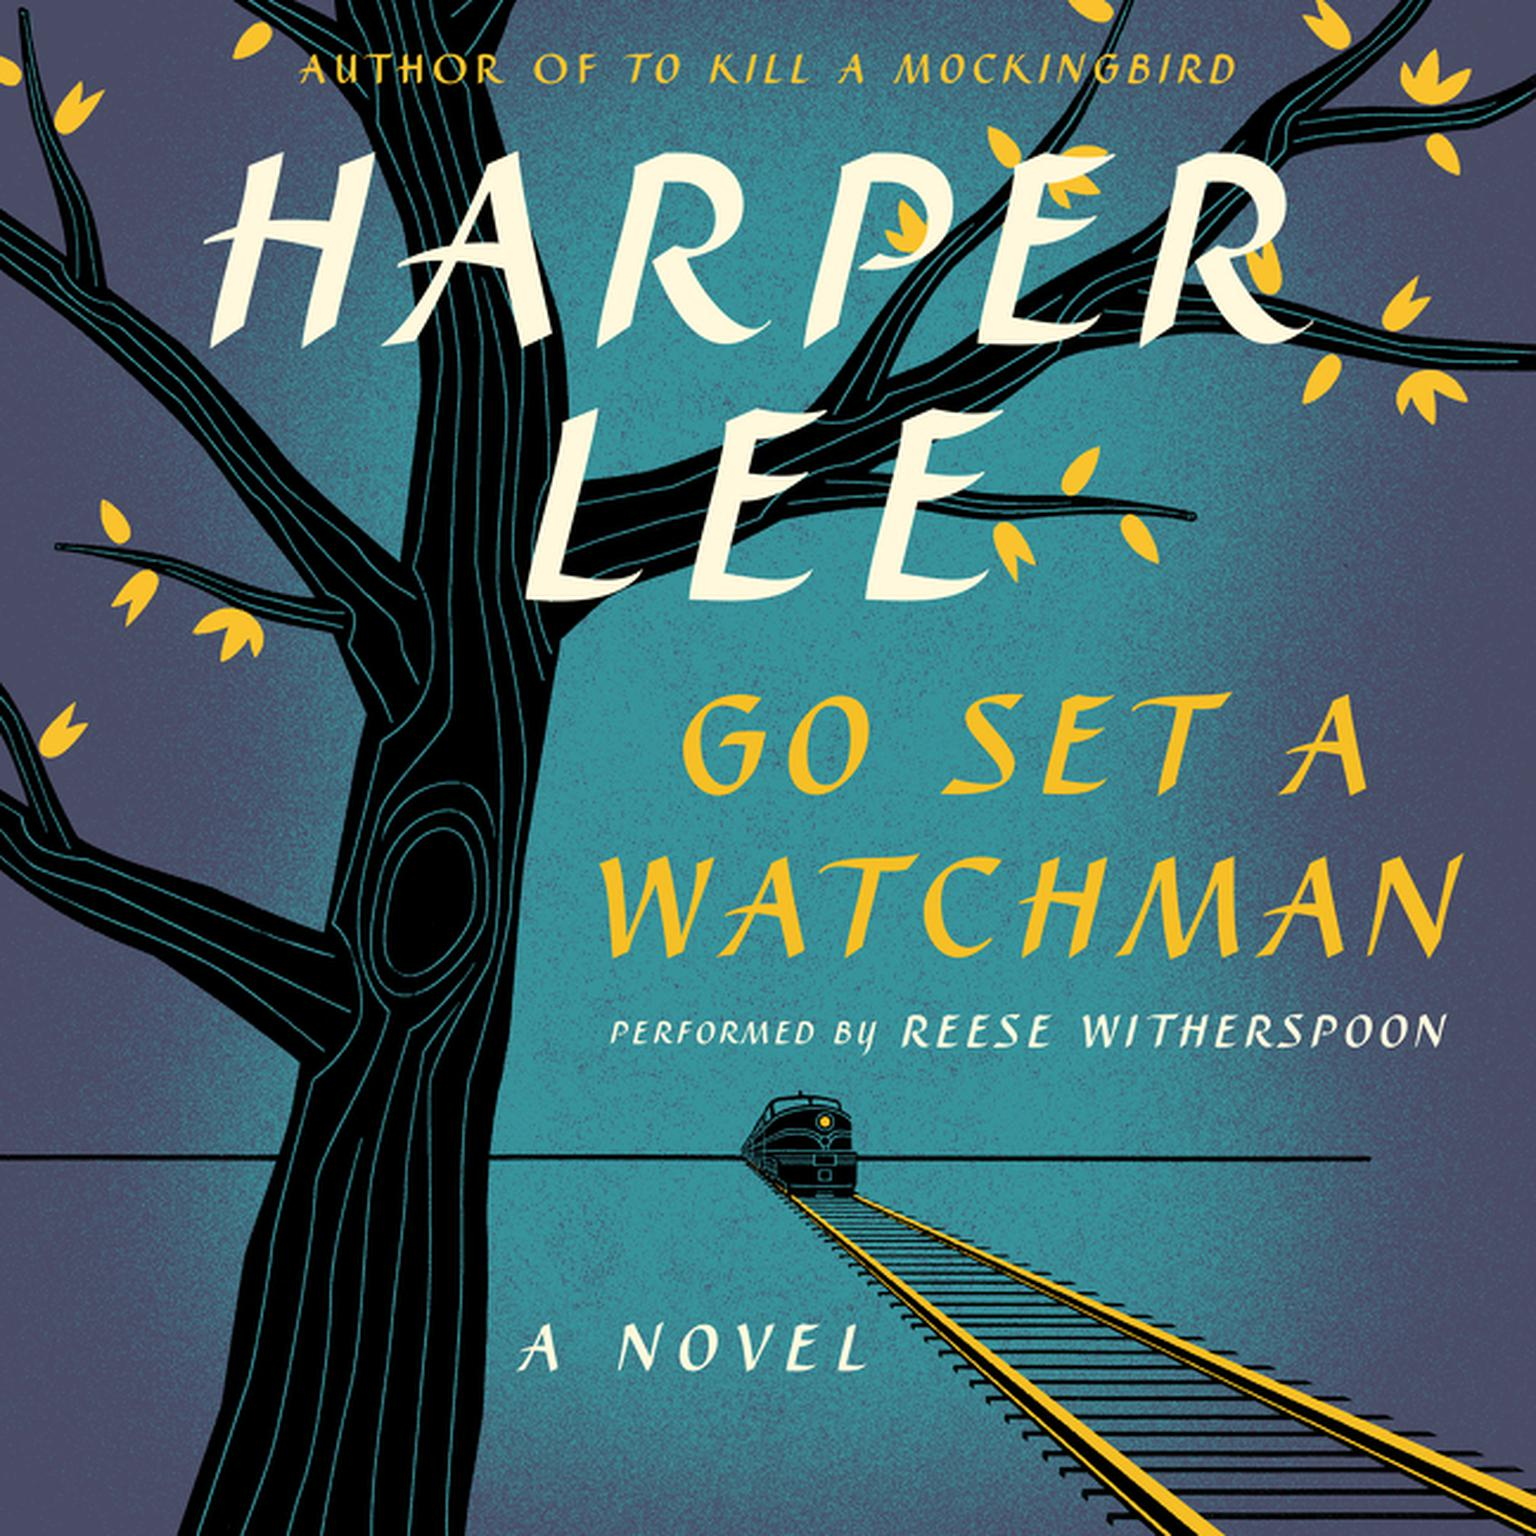 Printable Go Set a Watchman: A Novel Audiobook Cover Art